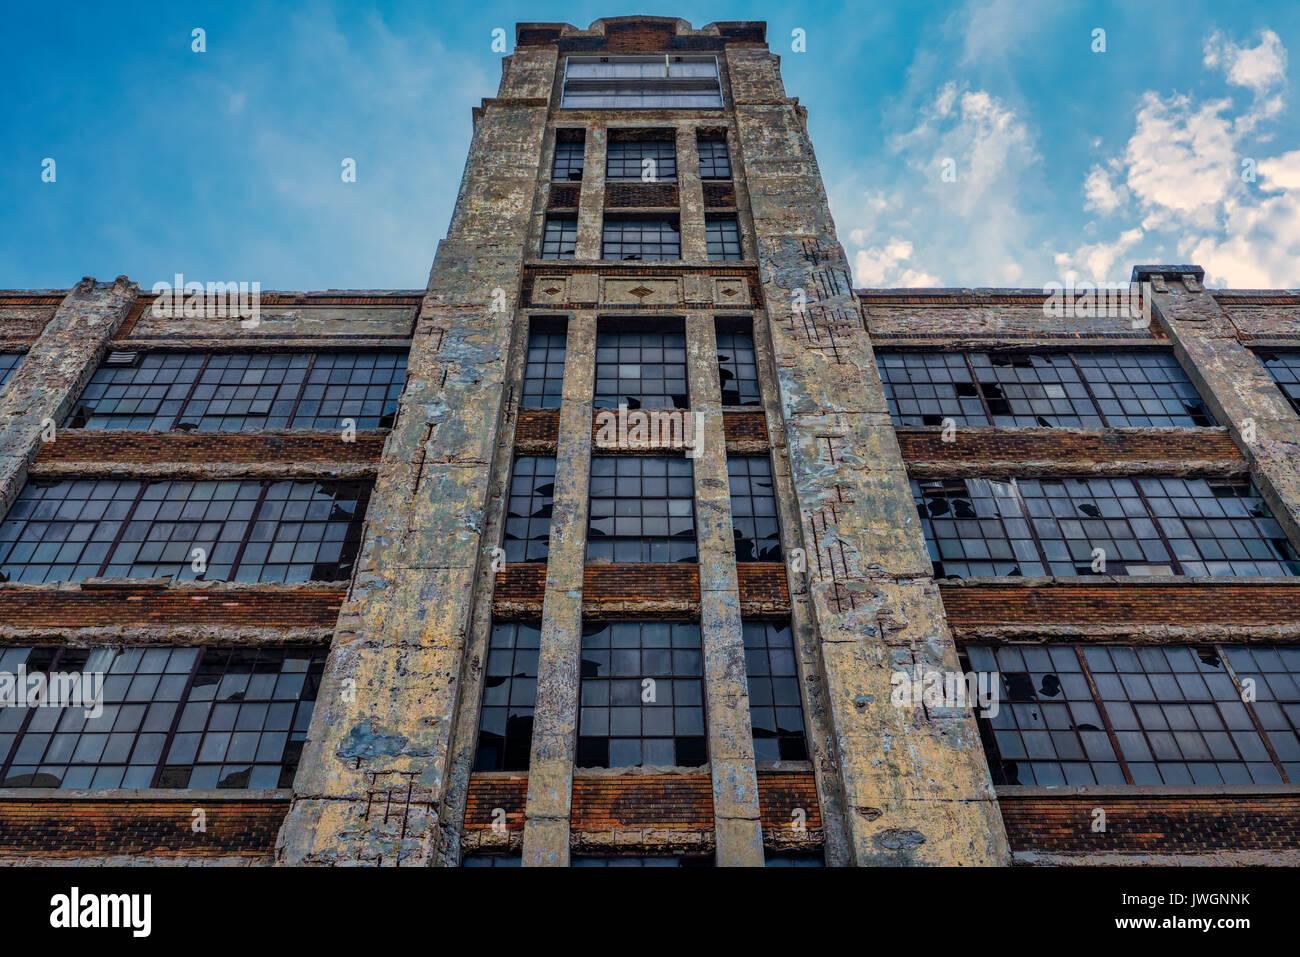 Wrecking Ball Building : Wrecking stock photos images alamy